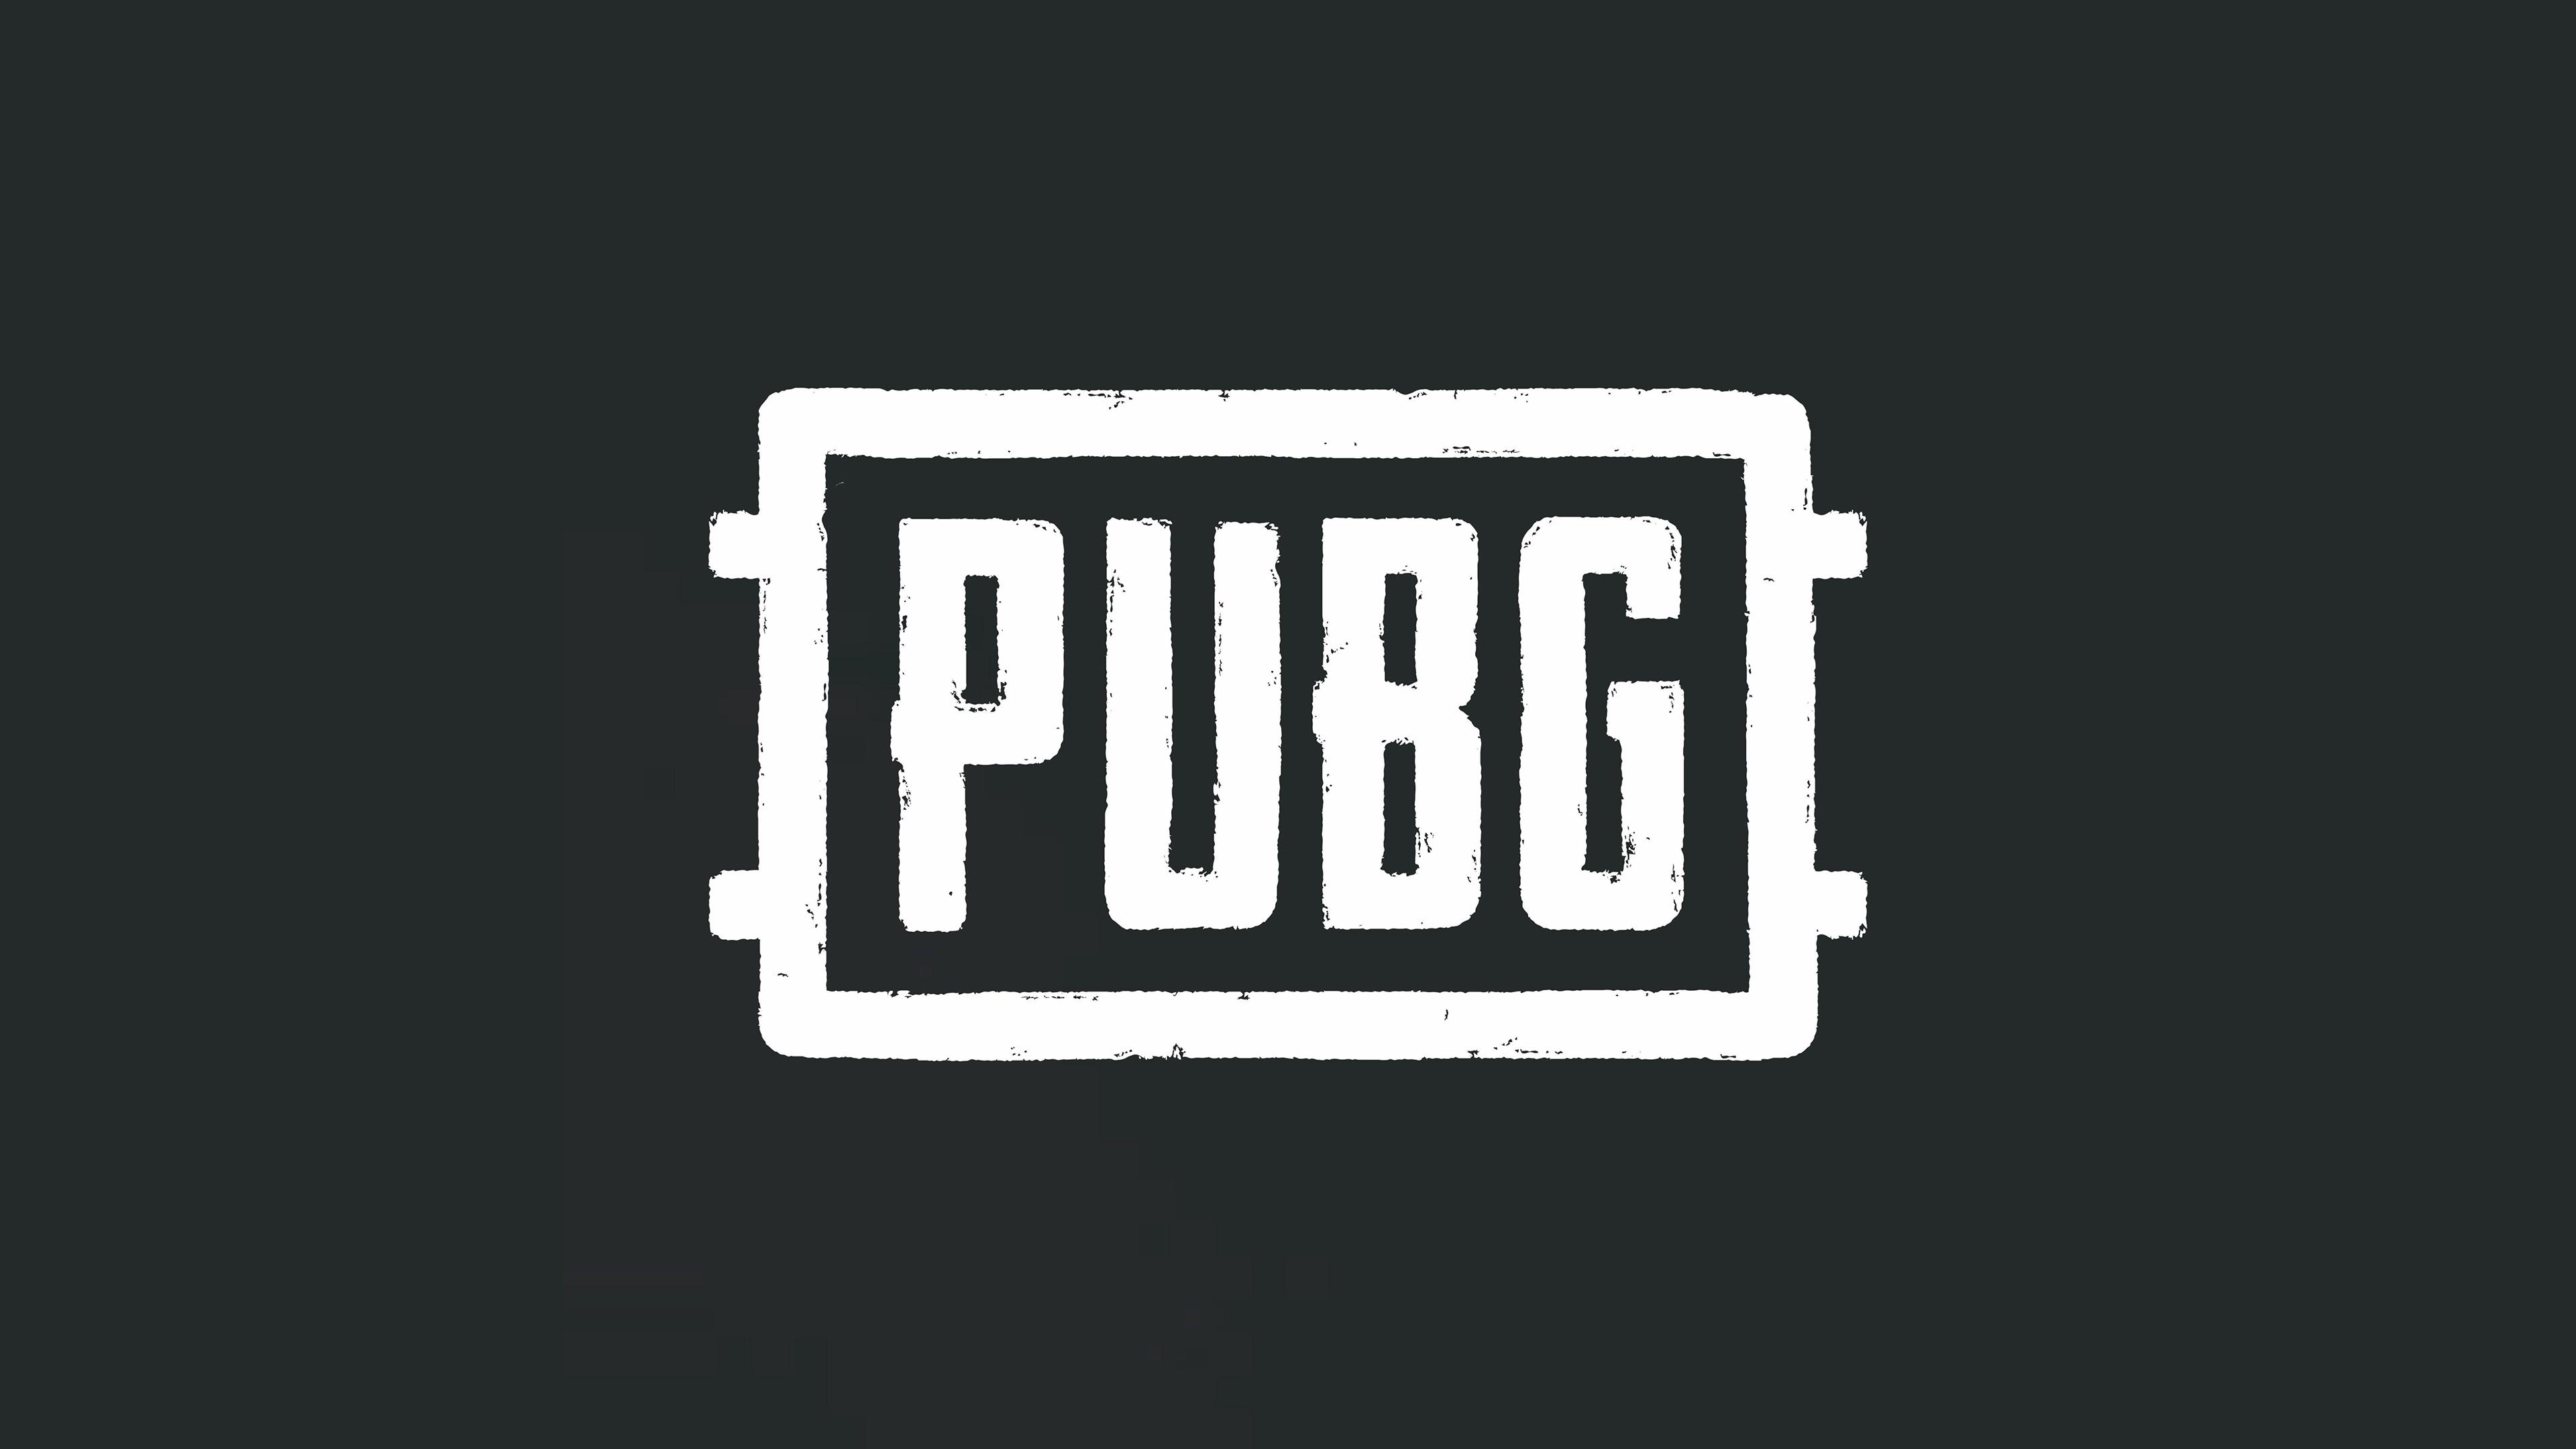 PUBG Game Logo 4k HD Games 4k Wallpapers Images